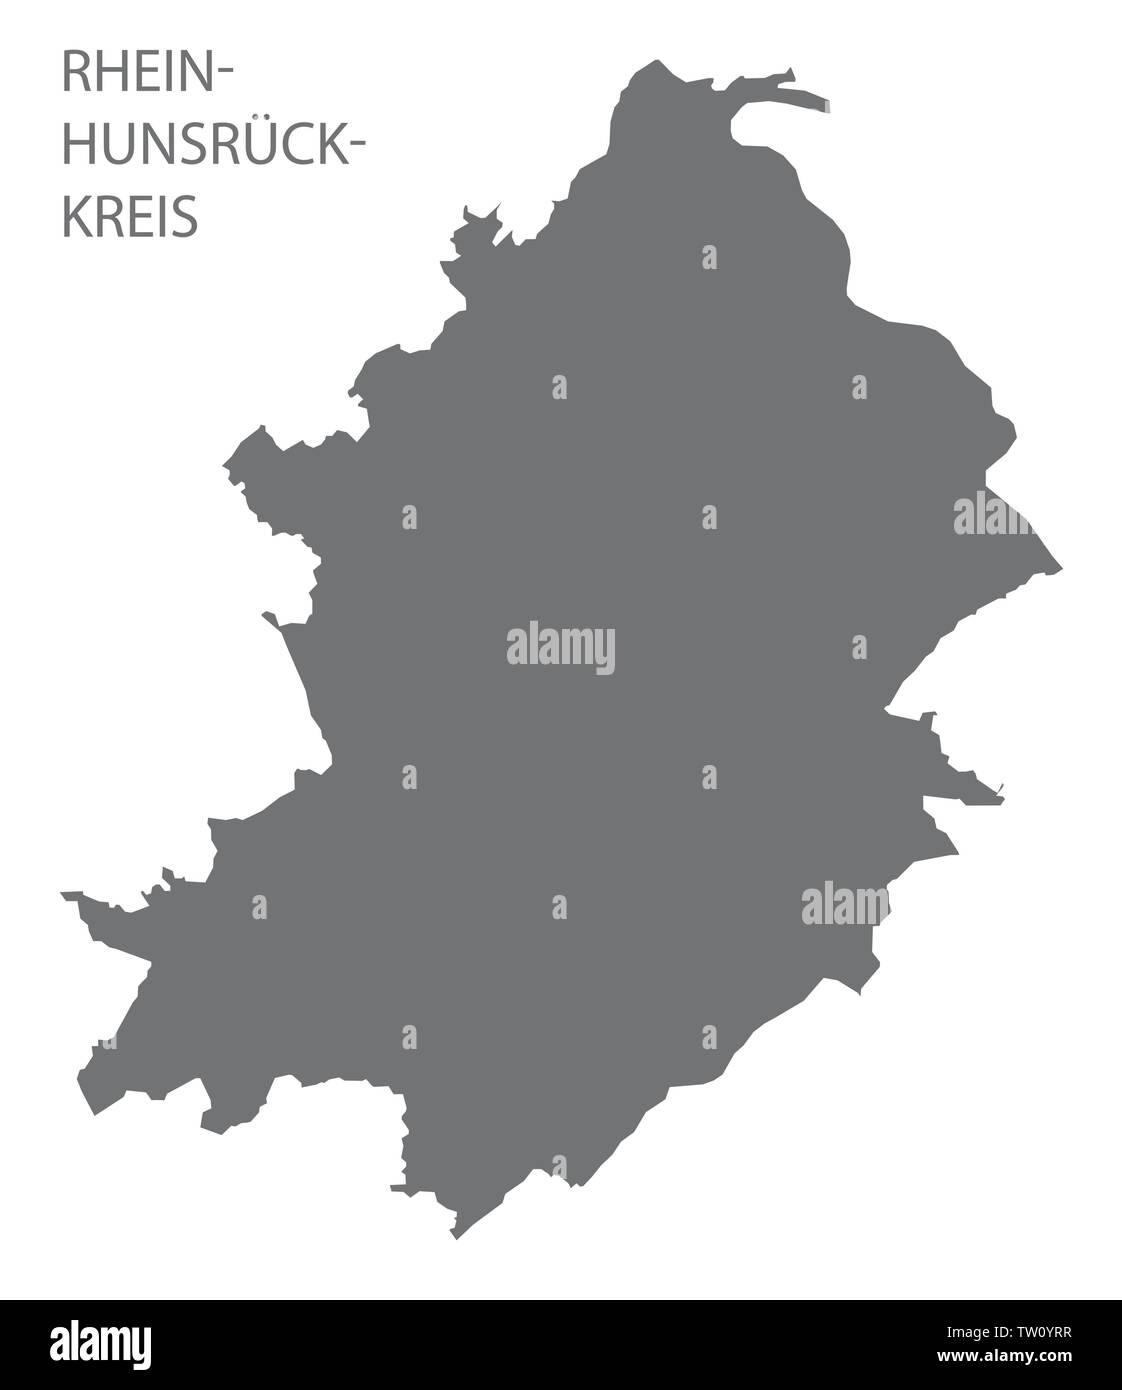 Rhein-Hunsrueck-Kreis grey county map of Rhineland-Palatinate DE - Stock Image